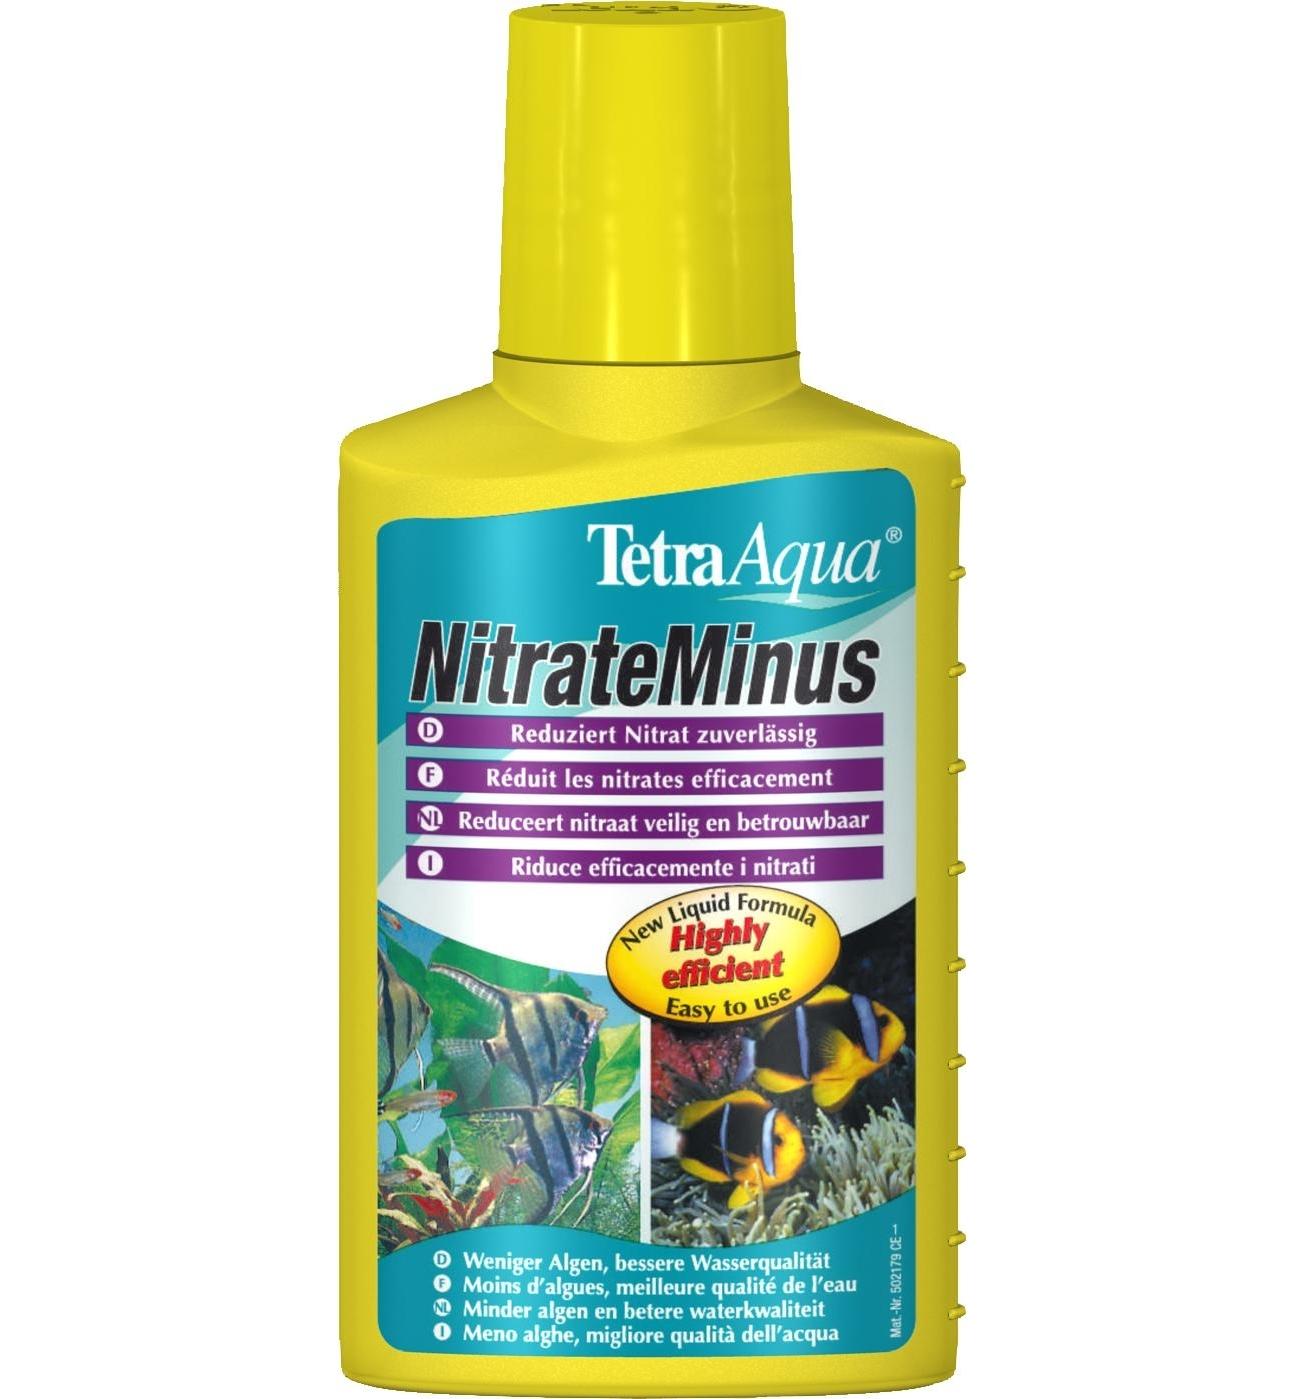 Препараты Жидкое средство для снижения концентрации нитратов, Tetra Nitrate Minus product_3c89f2ae85_l.jpg